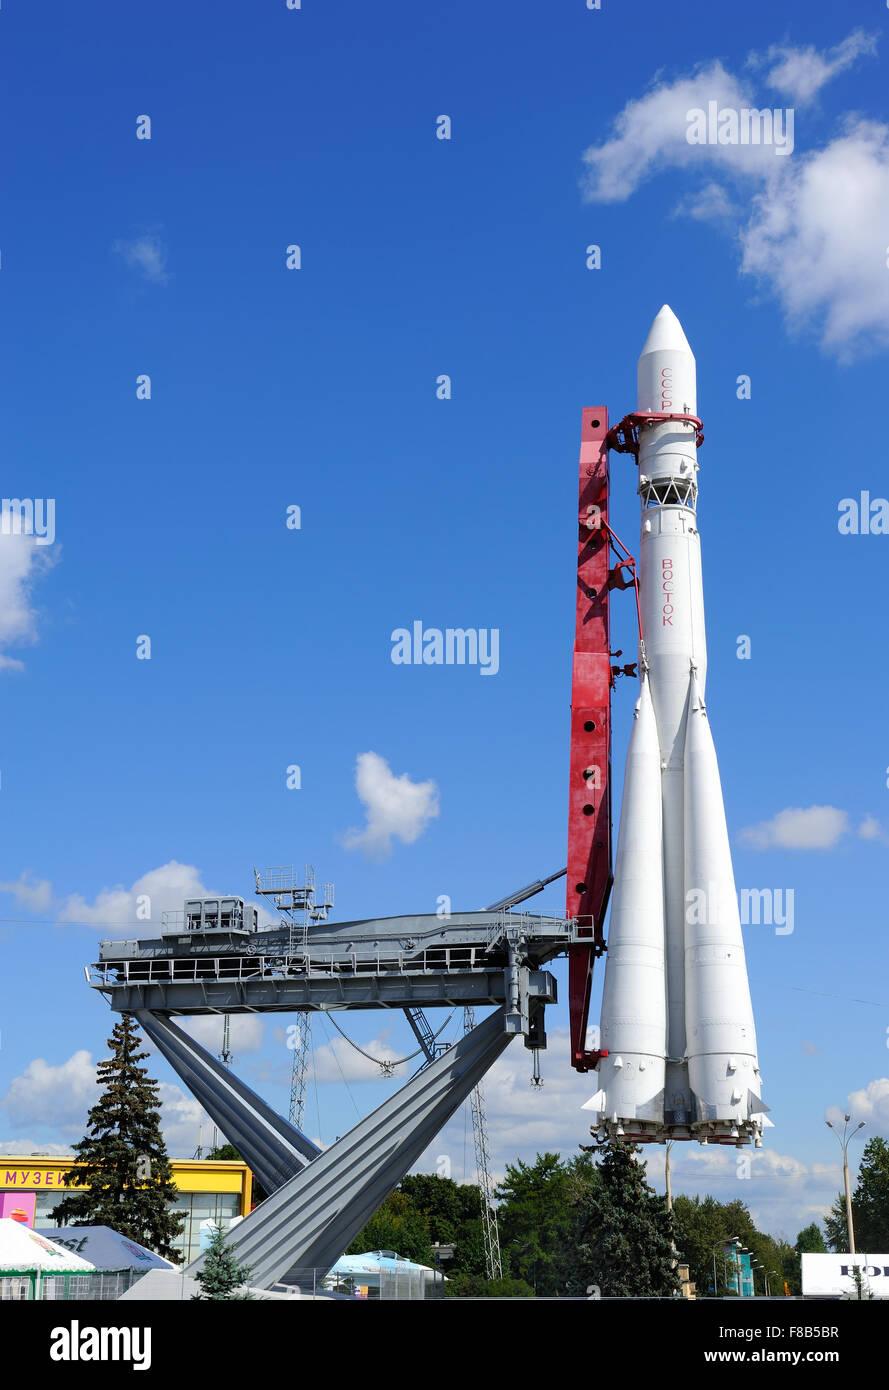 Soviet memorial dedicated to cosmonauts from kaliningrad - Rocket Vostok 1 A Monument To The Soviet Space Program Moscow Landmark